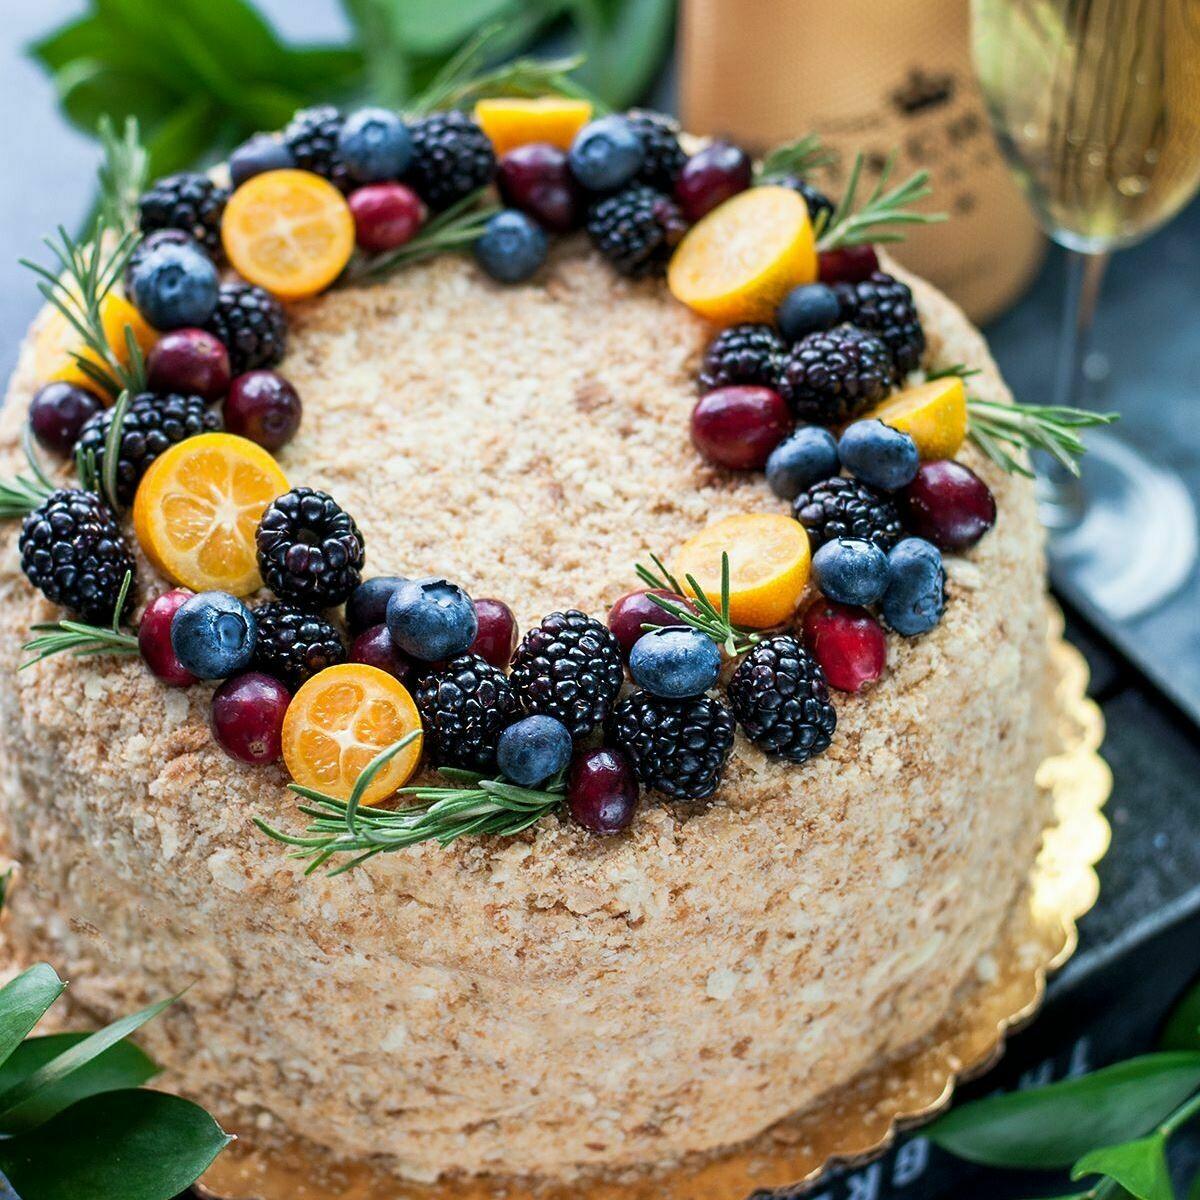 NAPOLEON CAKE (UNDER THE ORDER)